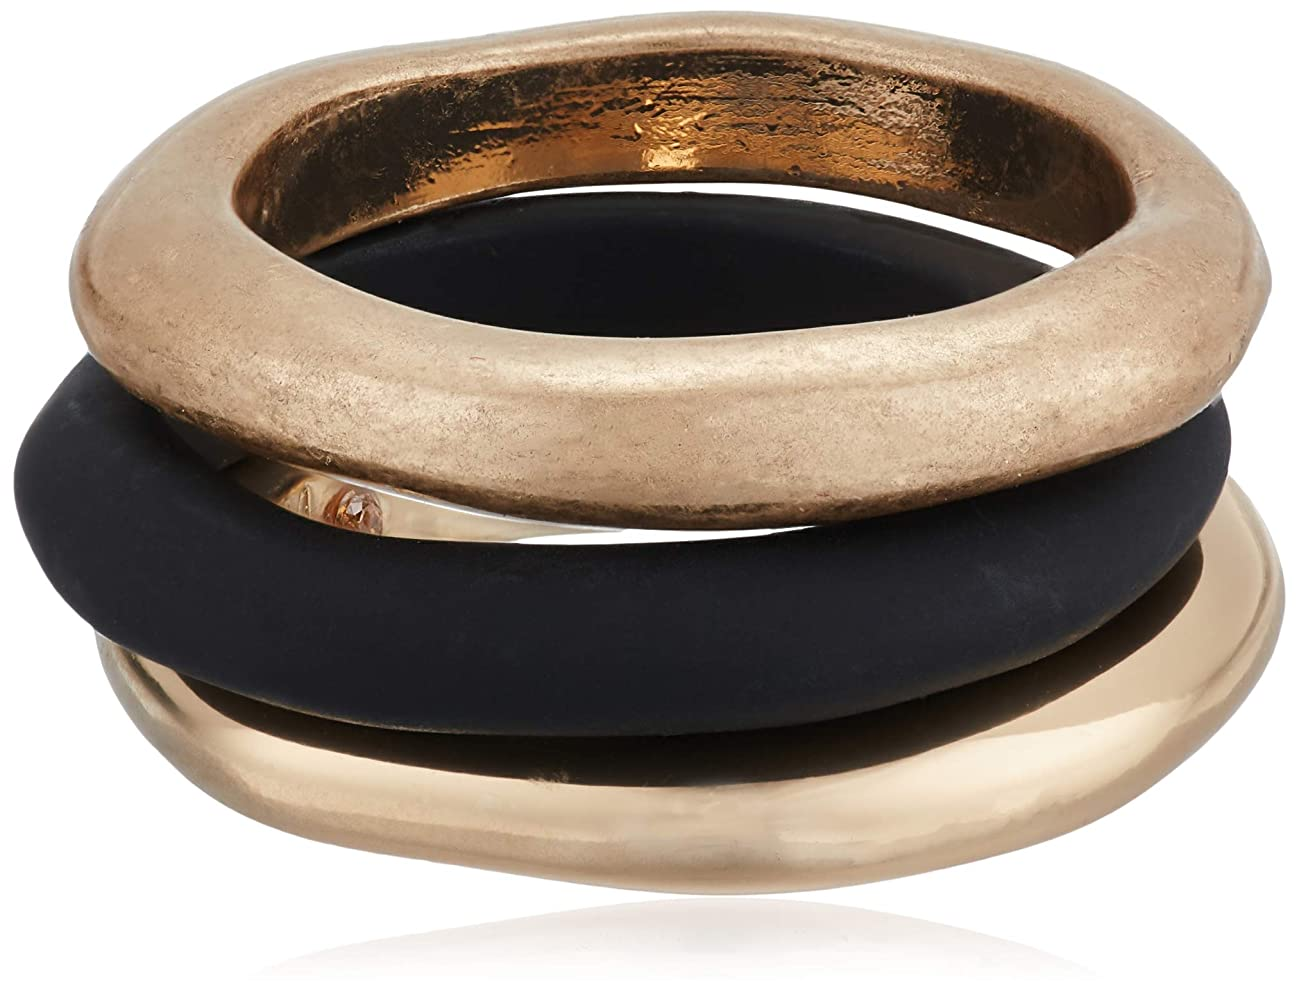 Robert Lee Morris Soho Women's Black Patina & Gold Sculptural Stackable Ring Set Size 8.5, One Size